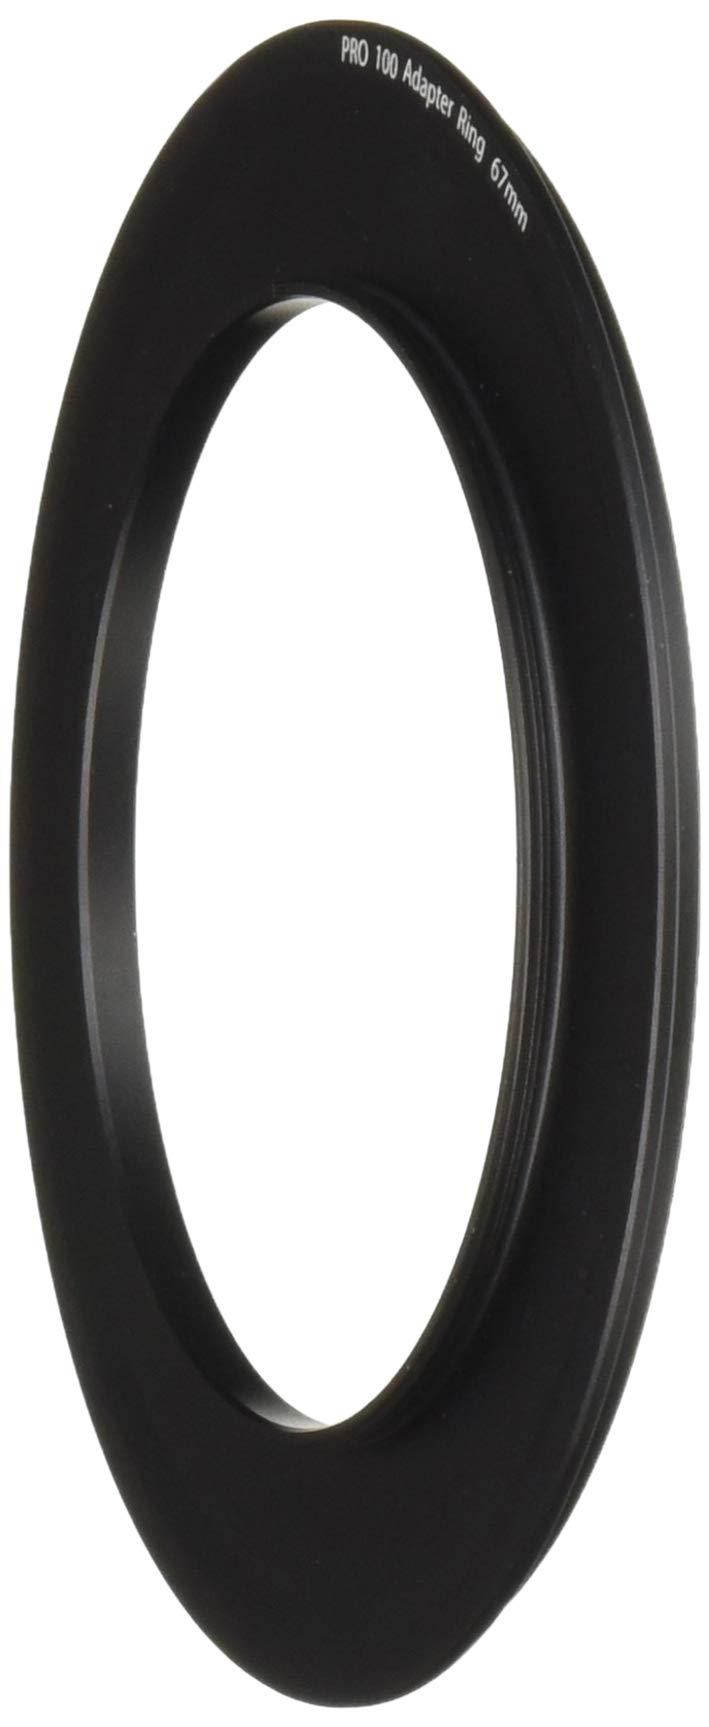 Tiffen Step Ring Camera Lens Square Filter, Black (PRO10067AR)